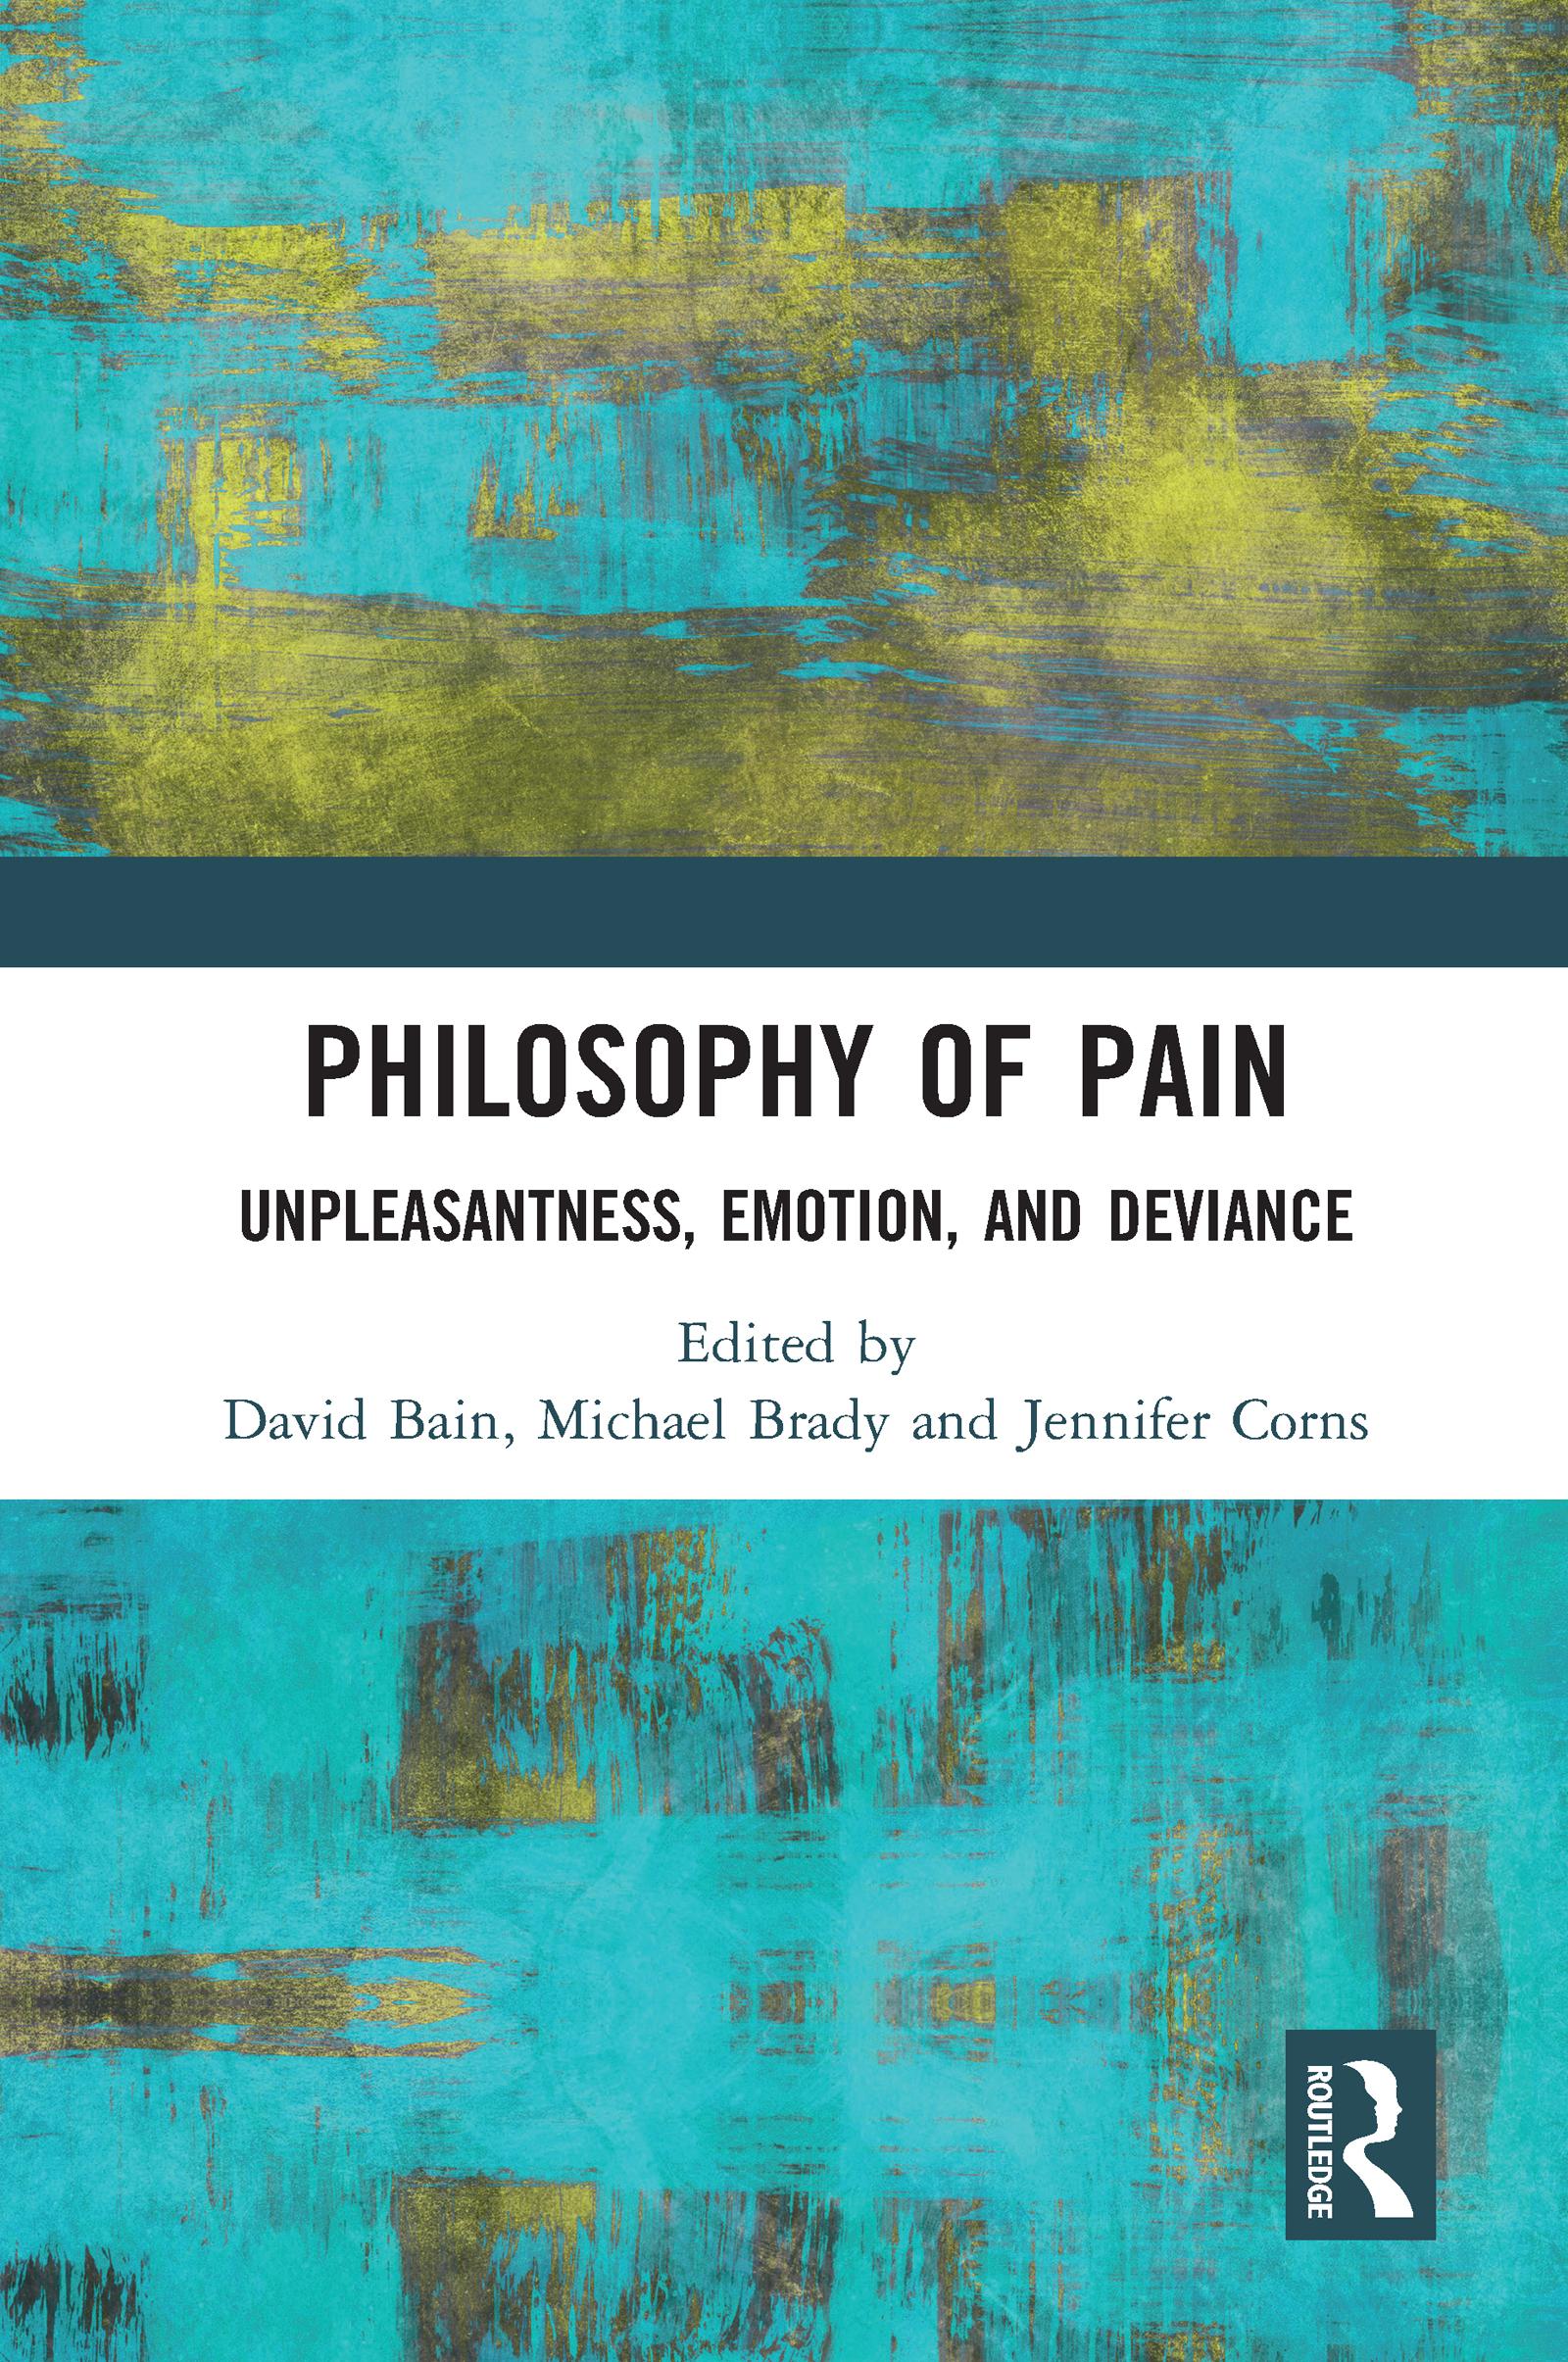 Philosophy of Pain